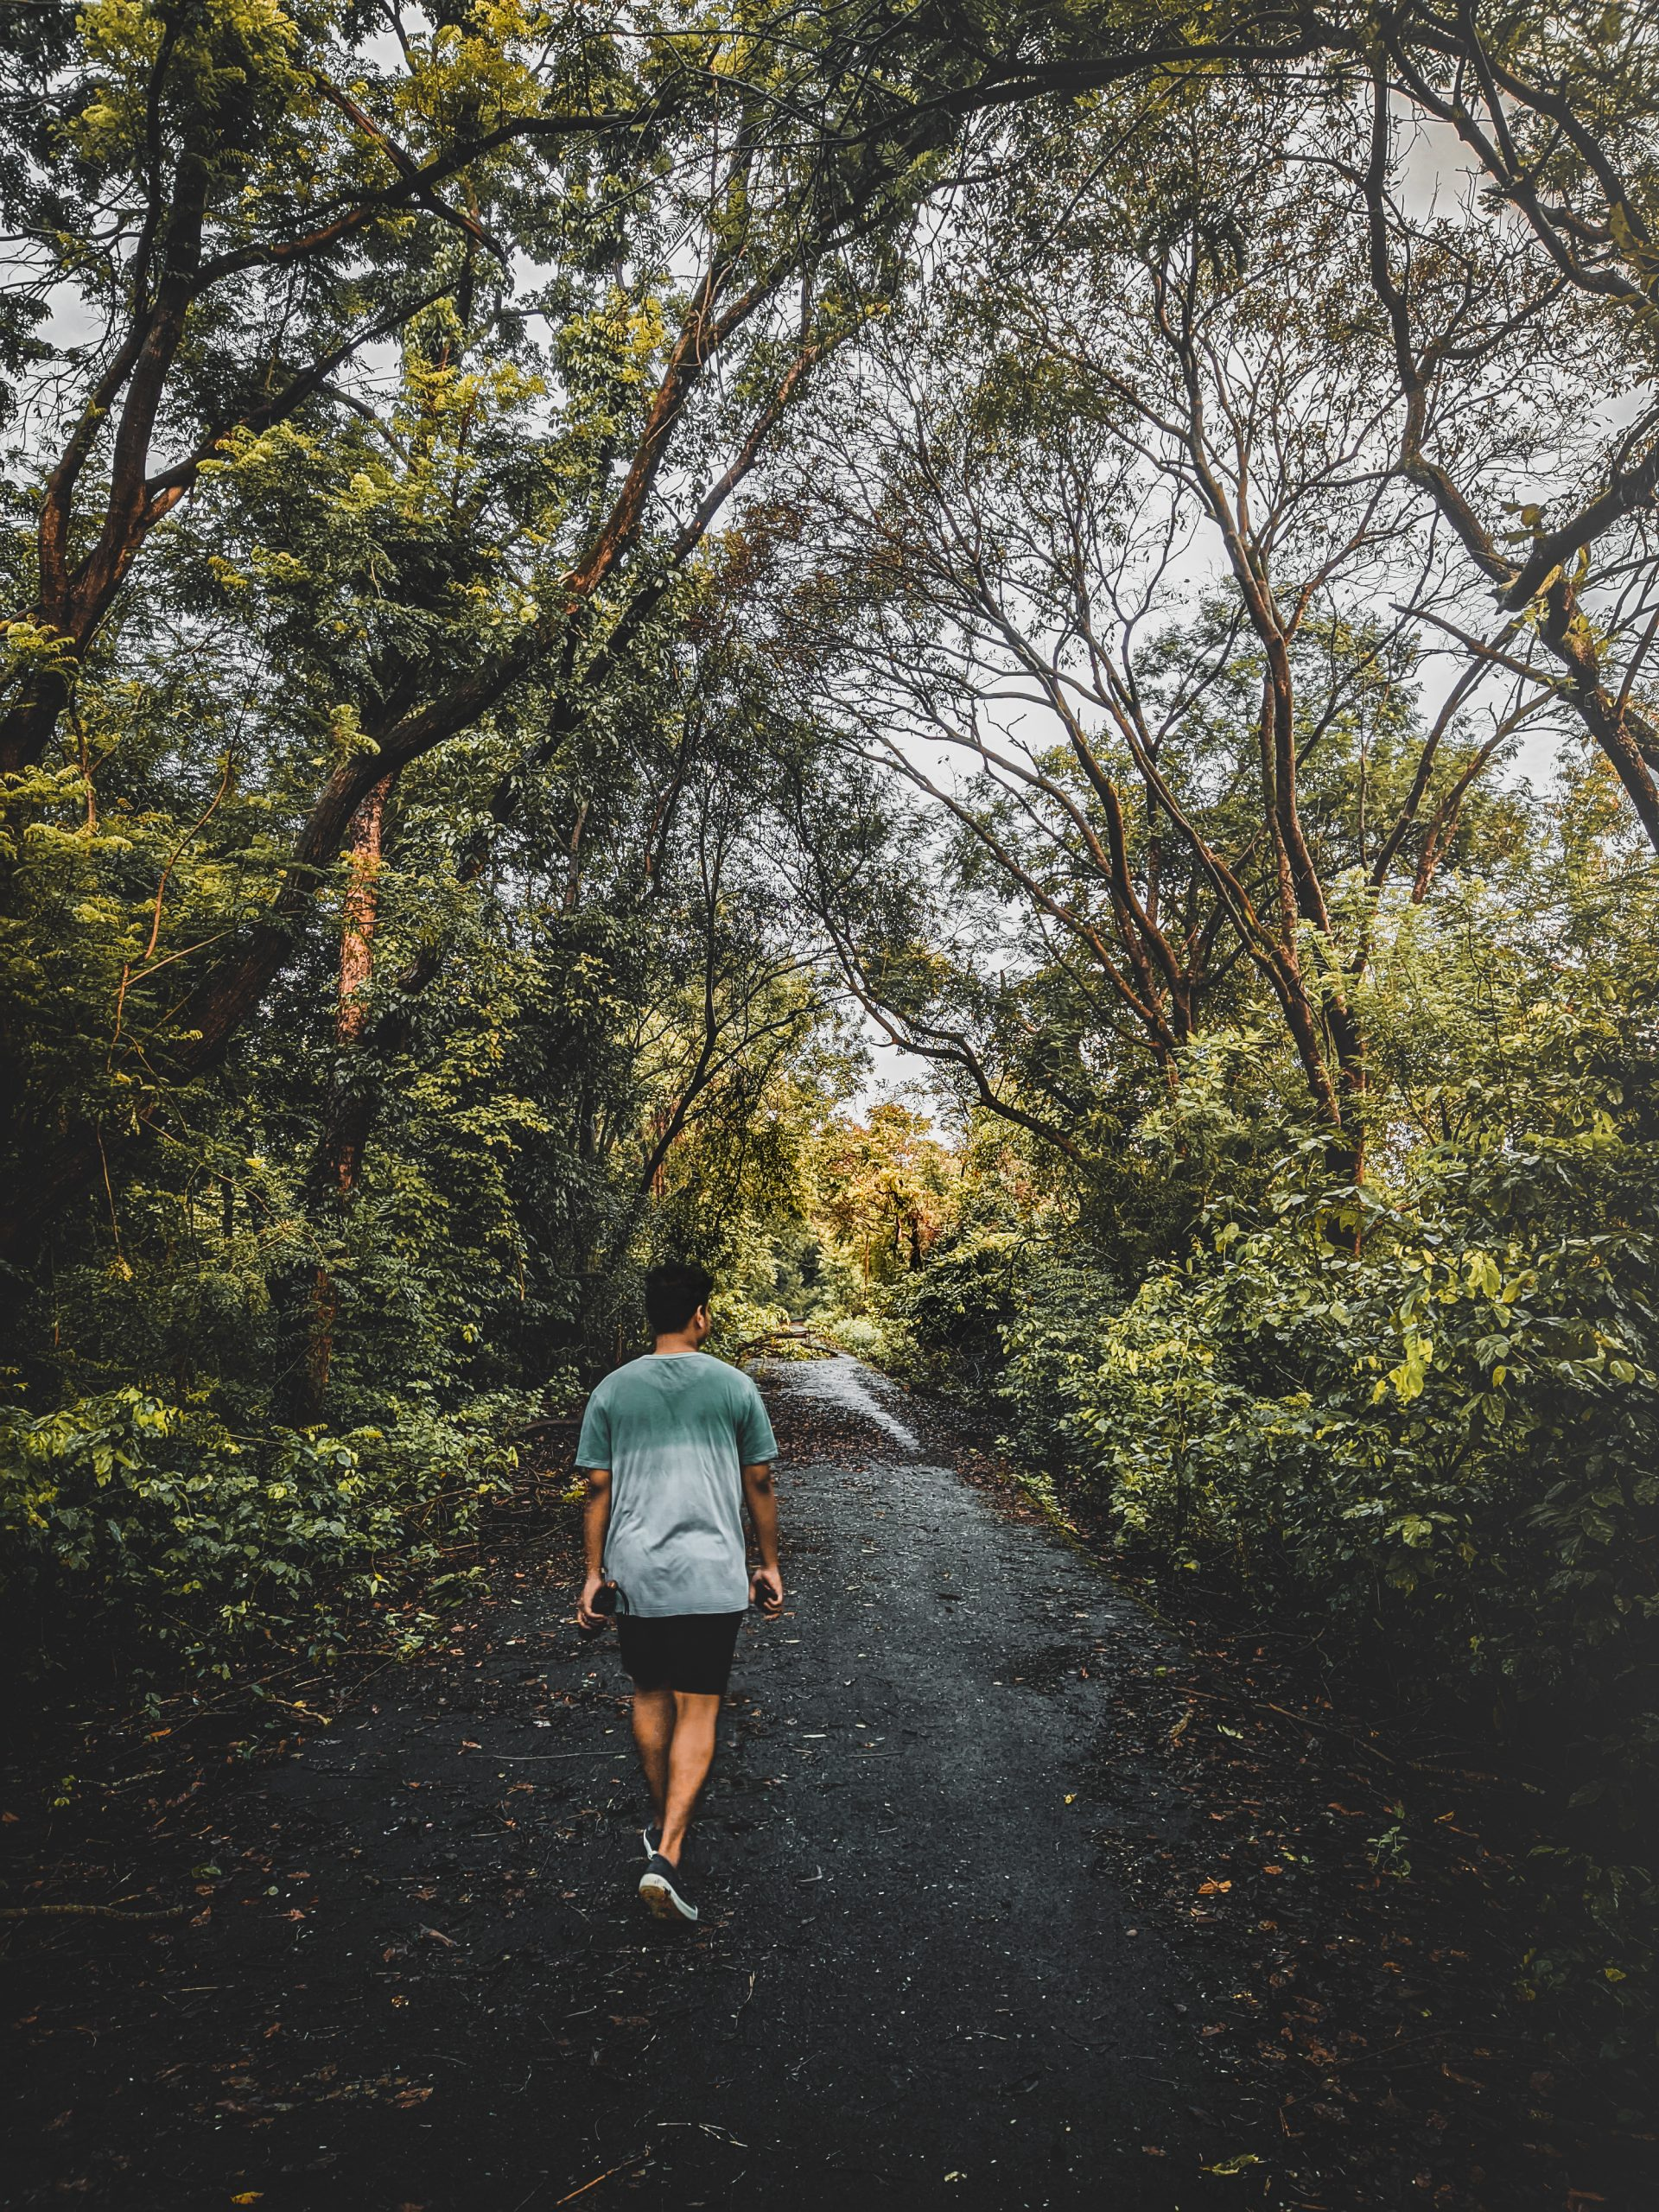 A morning walk through jungle